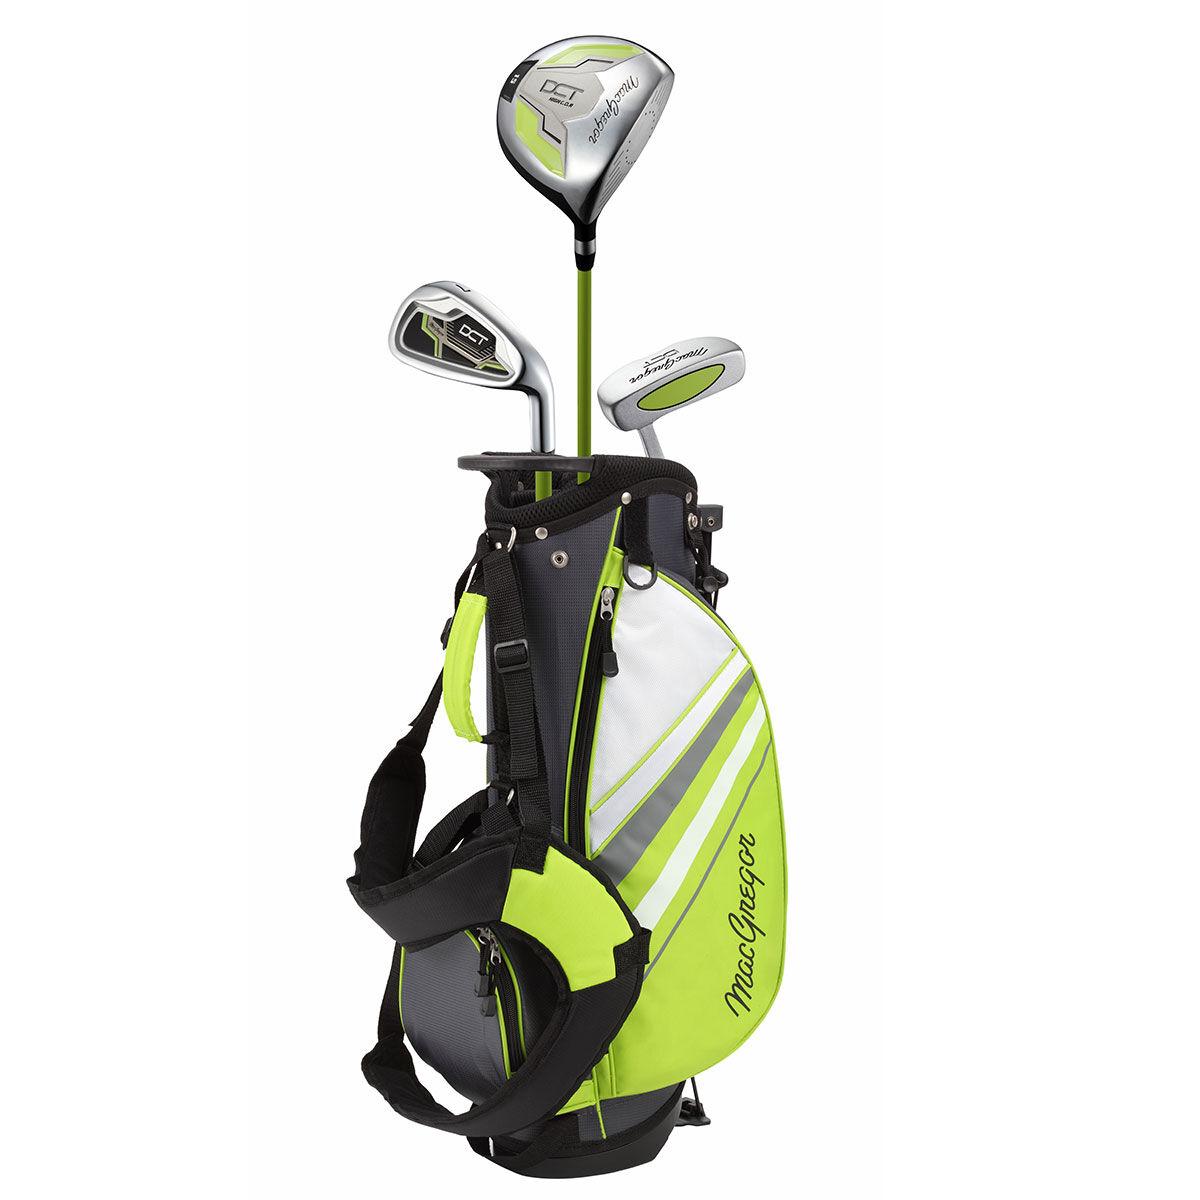 MacGregor DCT 3-5 Junior Golf Package Set, Unisex, Right hand, Green   American Golf